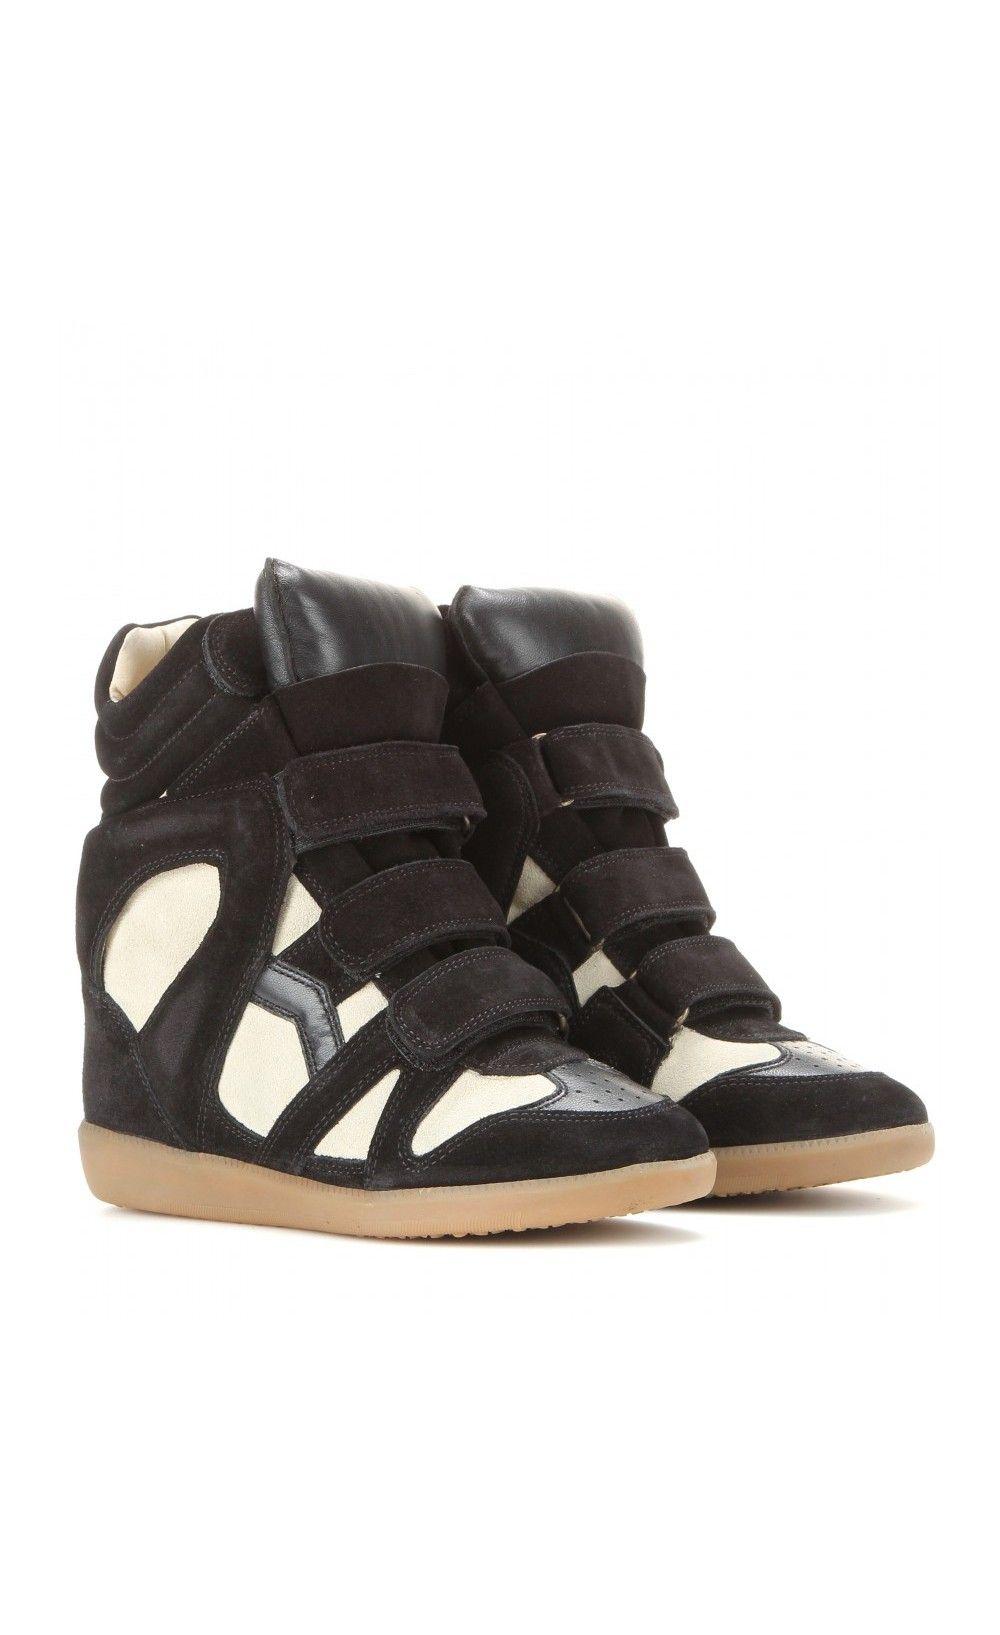 31dc95e89e Isabel Marant Bekett Wedge Sneakers Black & Ecru - Isabel Marant ...